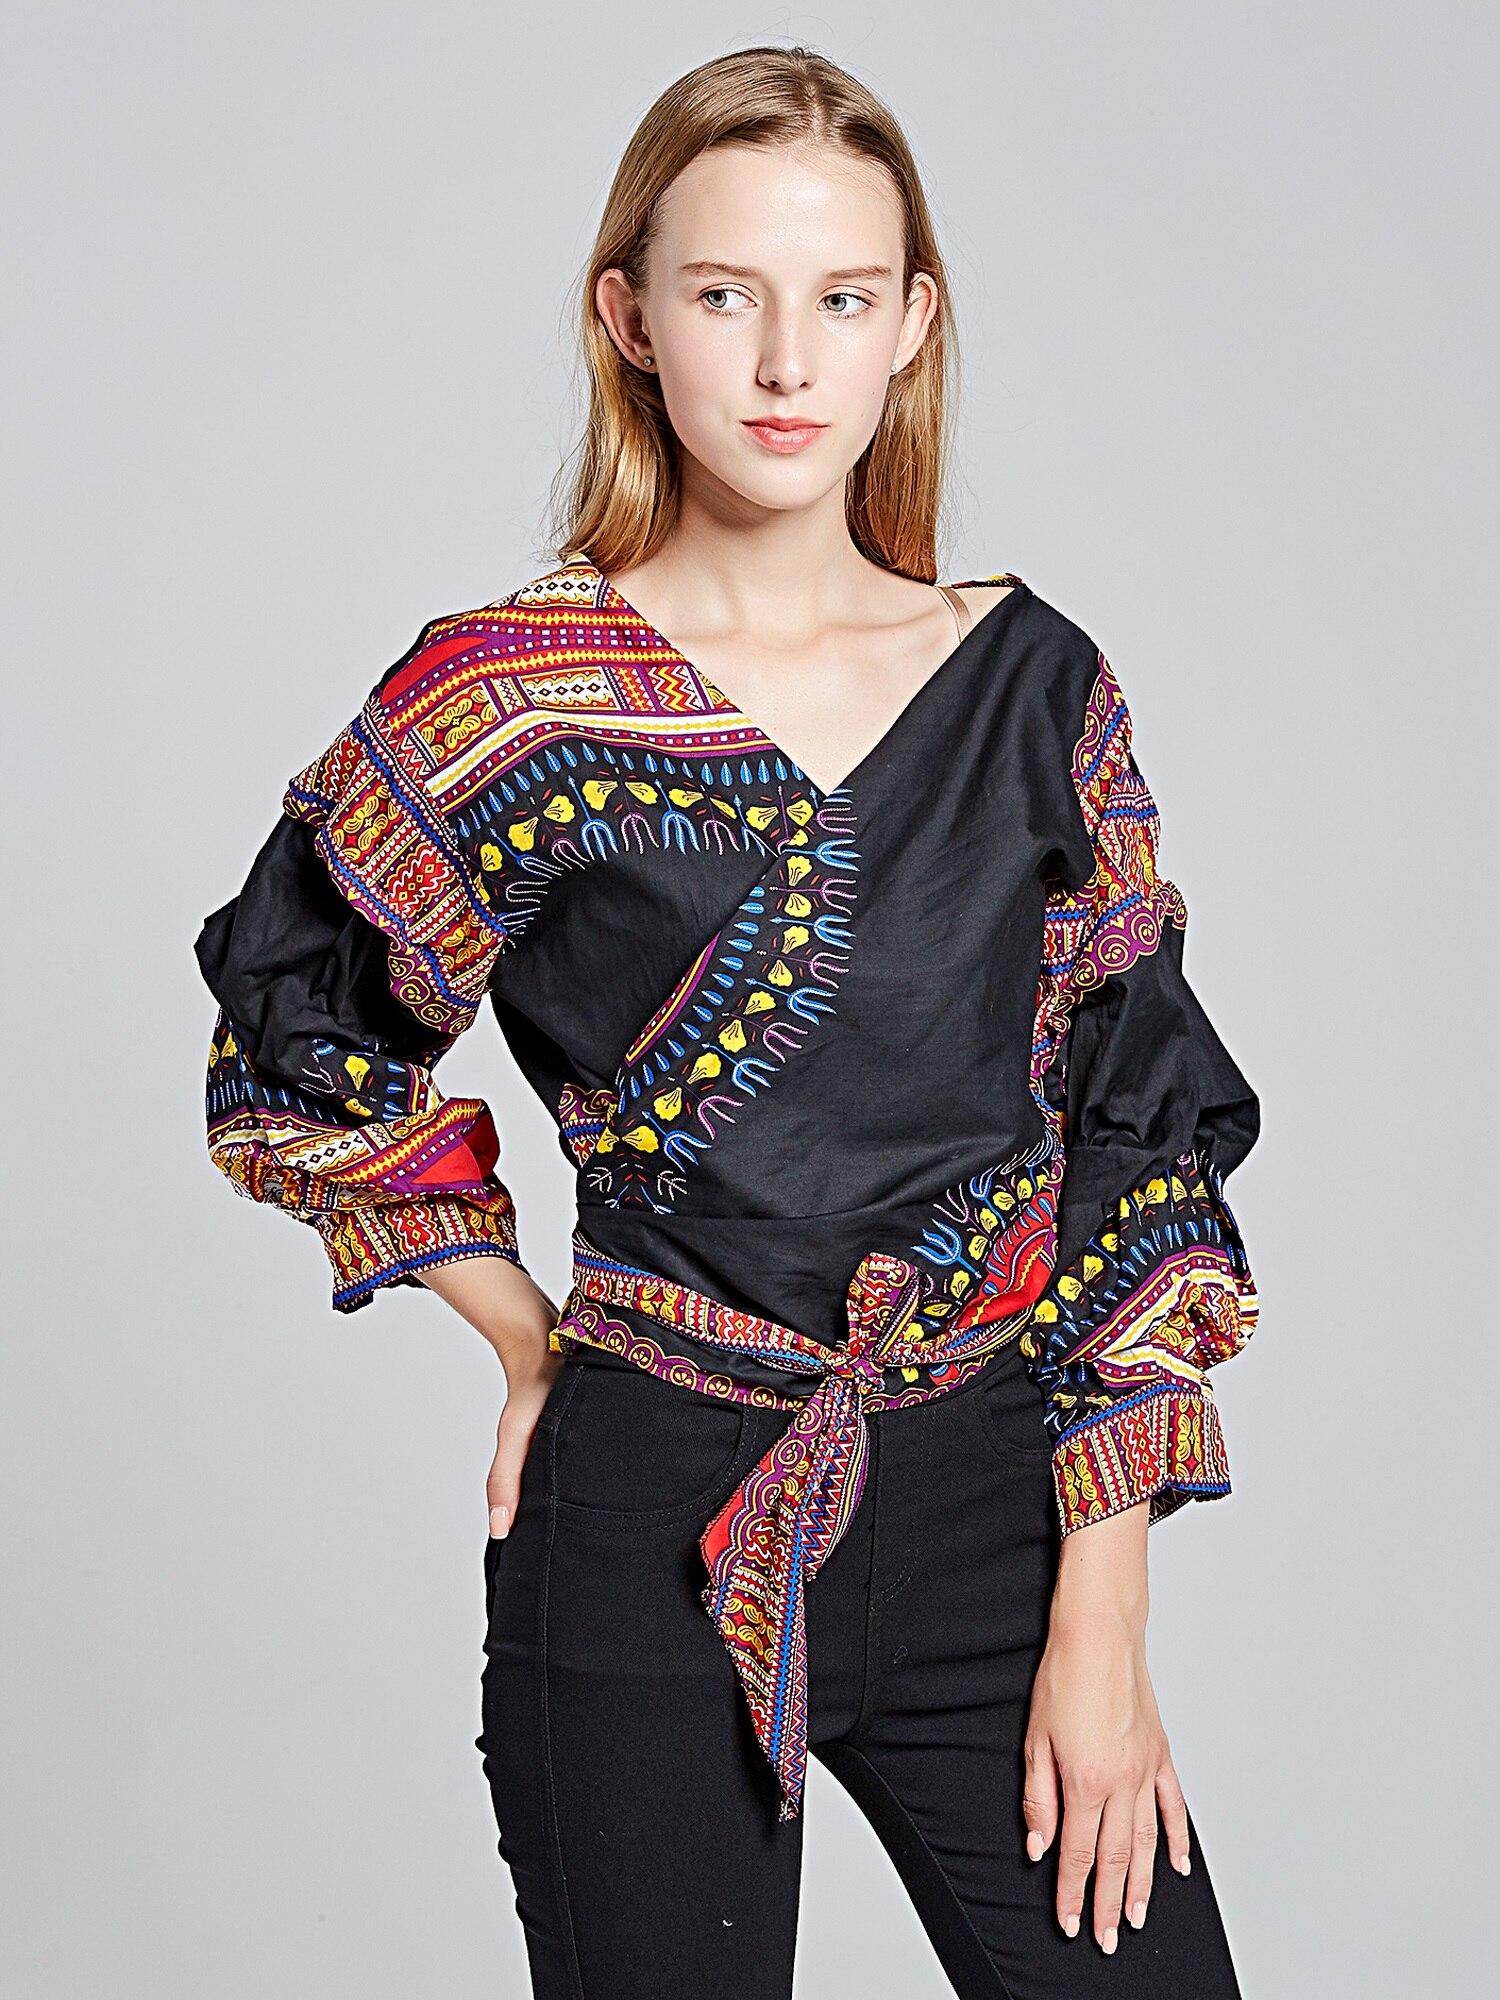 Girls V neck cross Dashiki 100% Cotton top Dashiki female vestido festa 2019